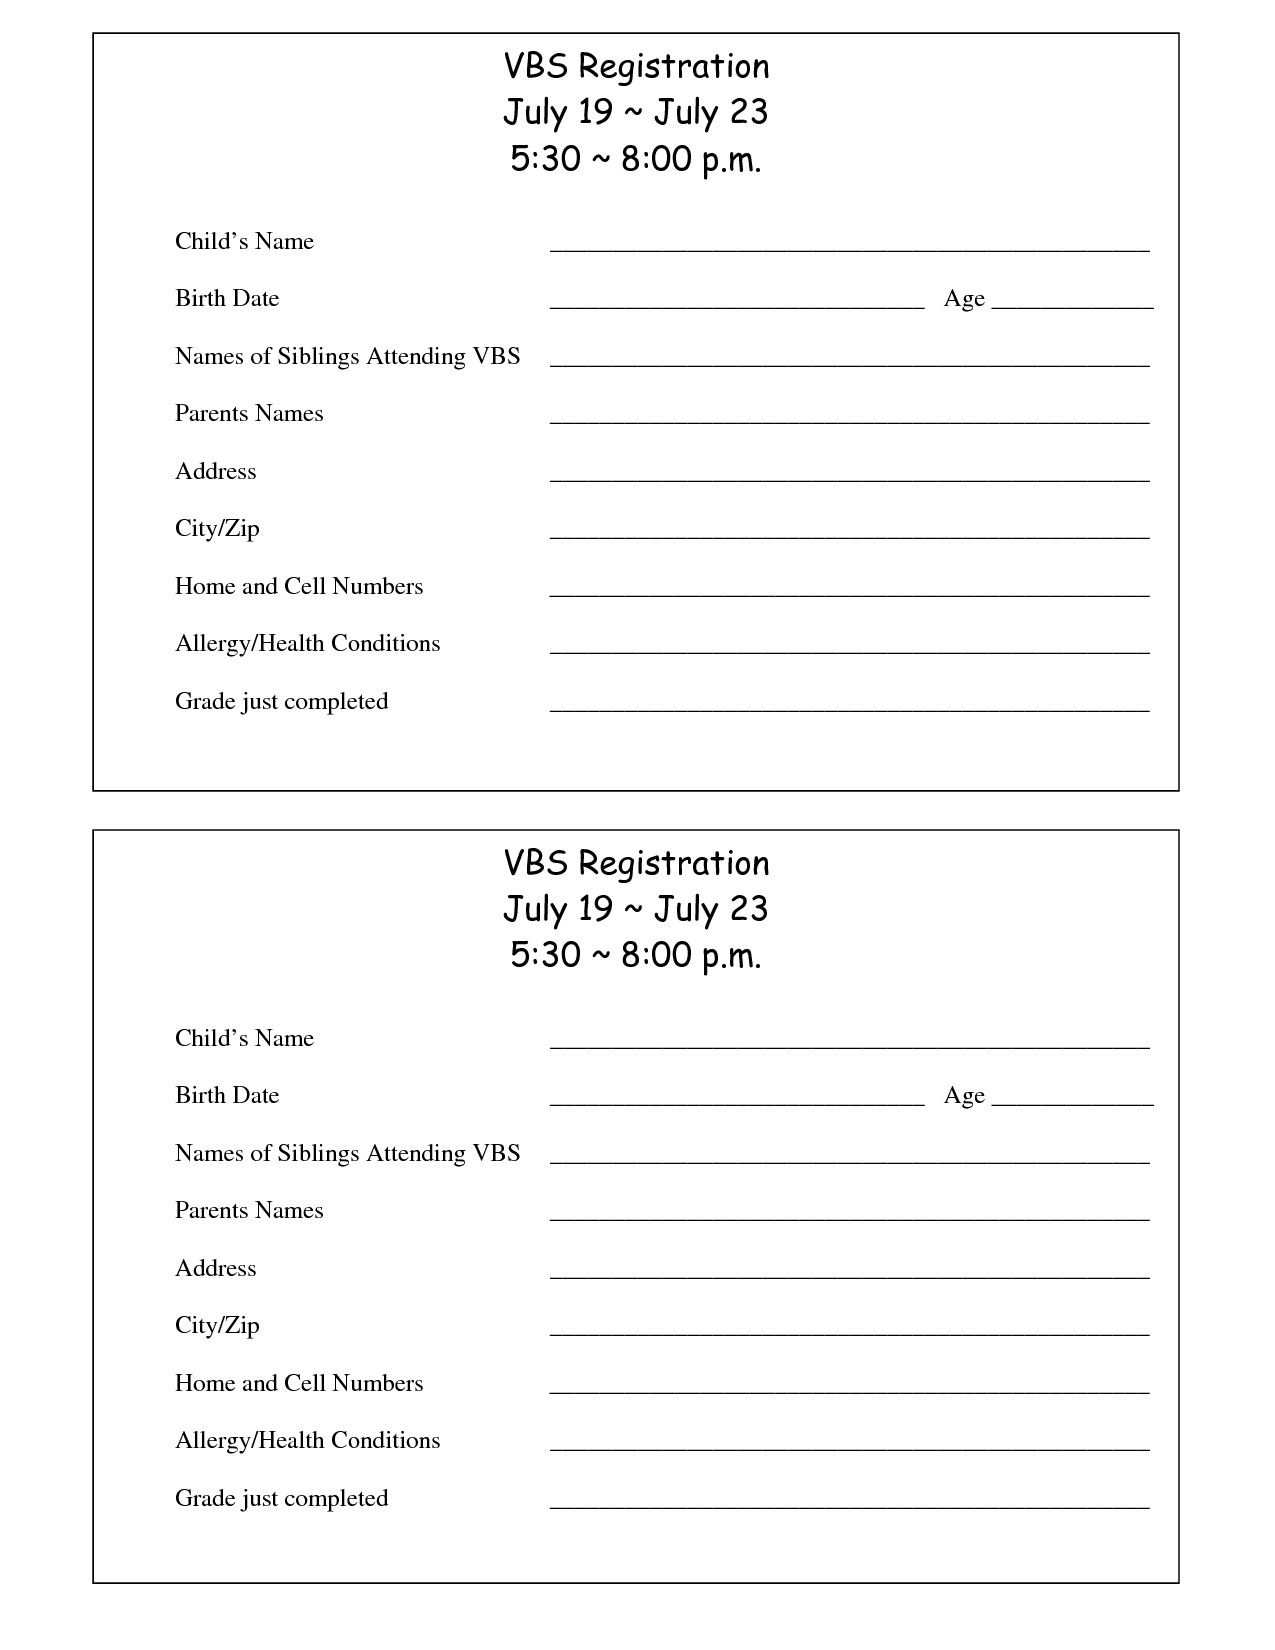 Registration Form Template Free Download Printable Vbs Registration Form Template Registration Form Sign In Sheet Sign In Sheet Template